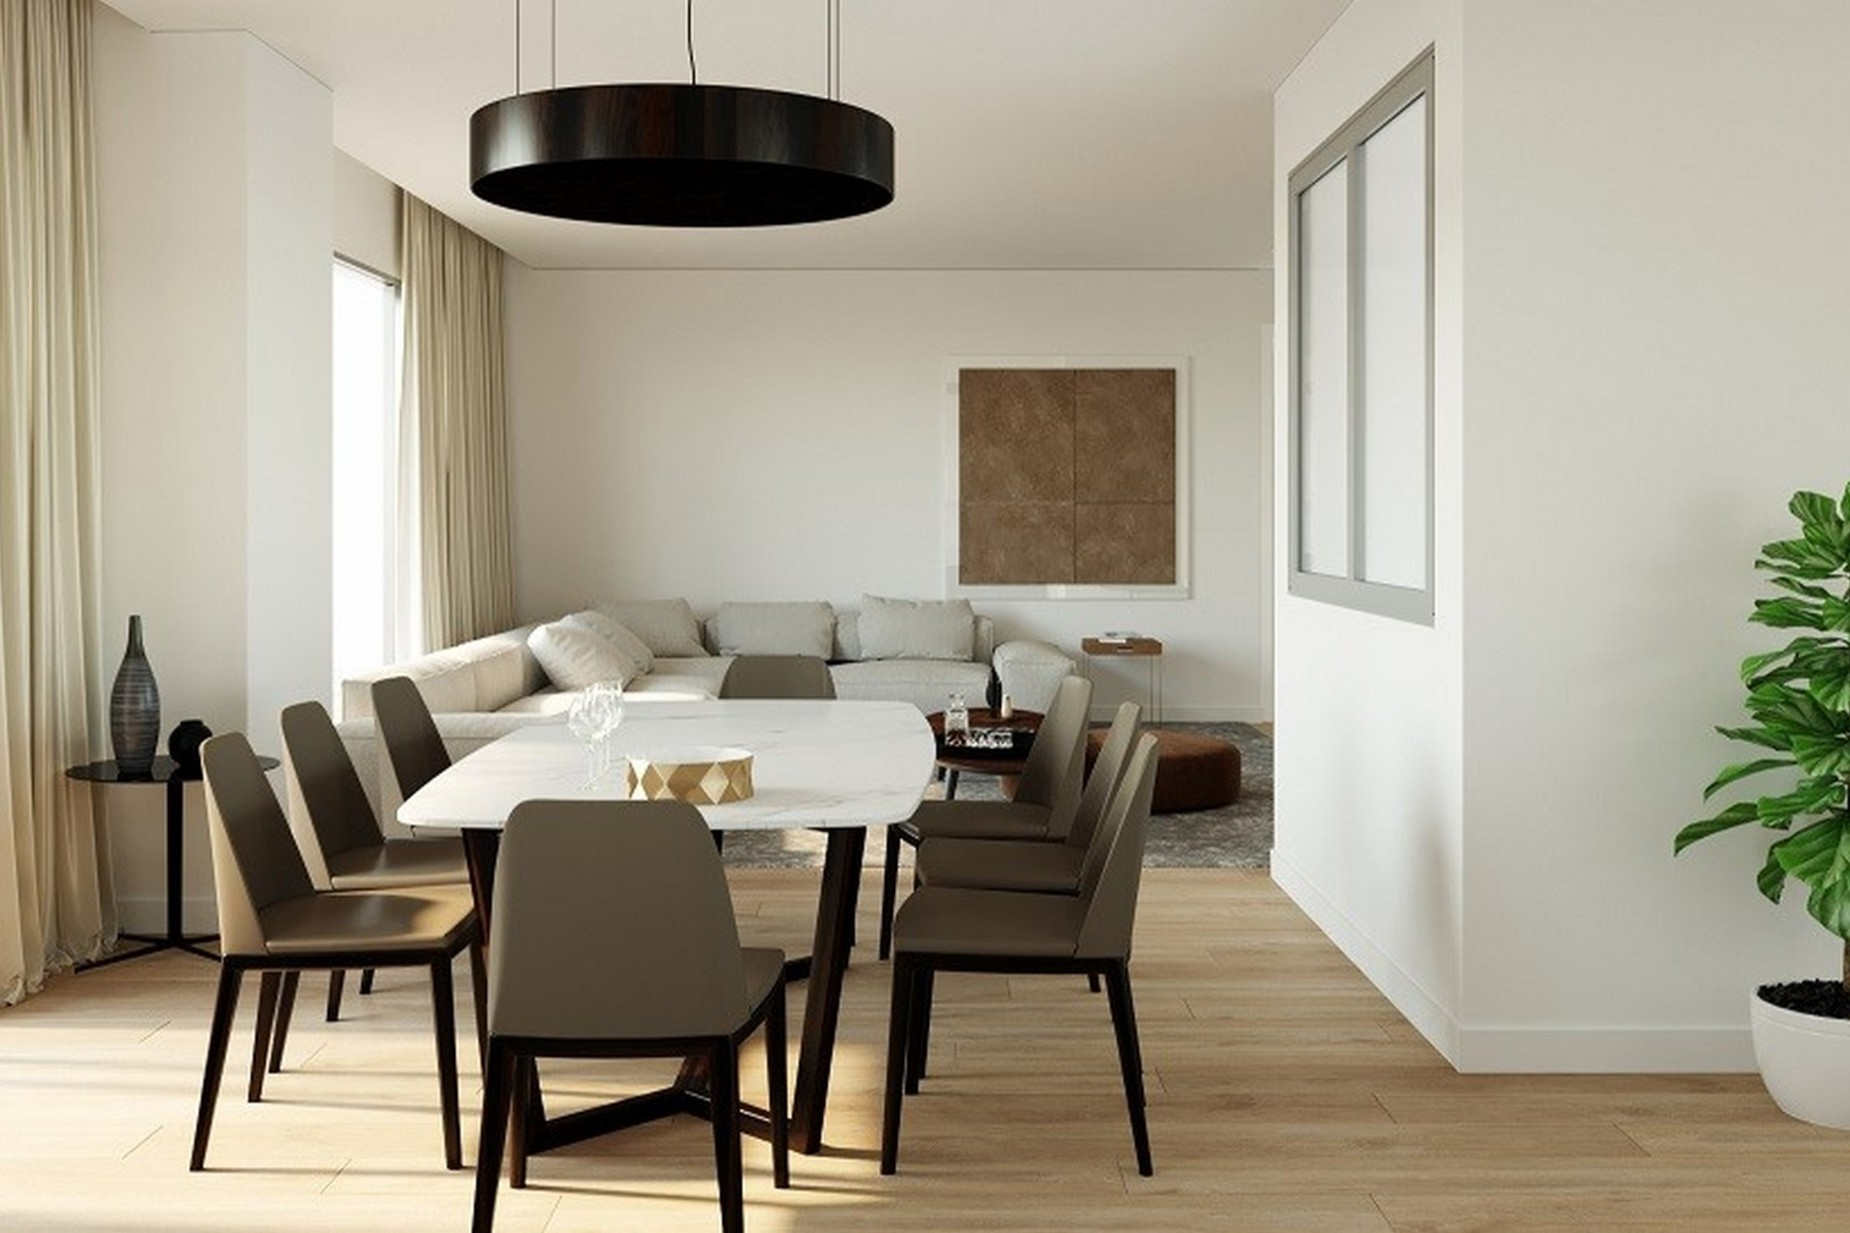 2 bed Apartment For Sale in Marsascala, Marsascala - thumb 3